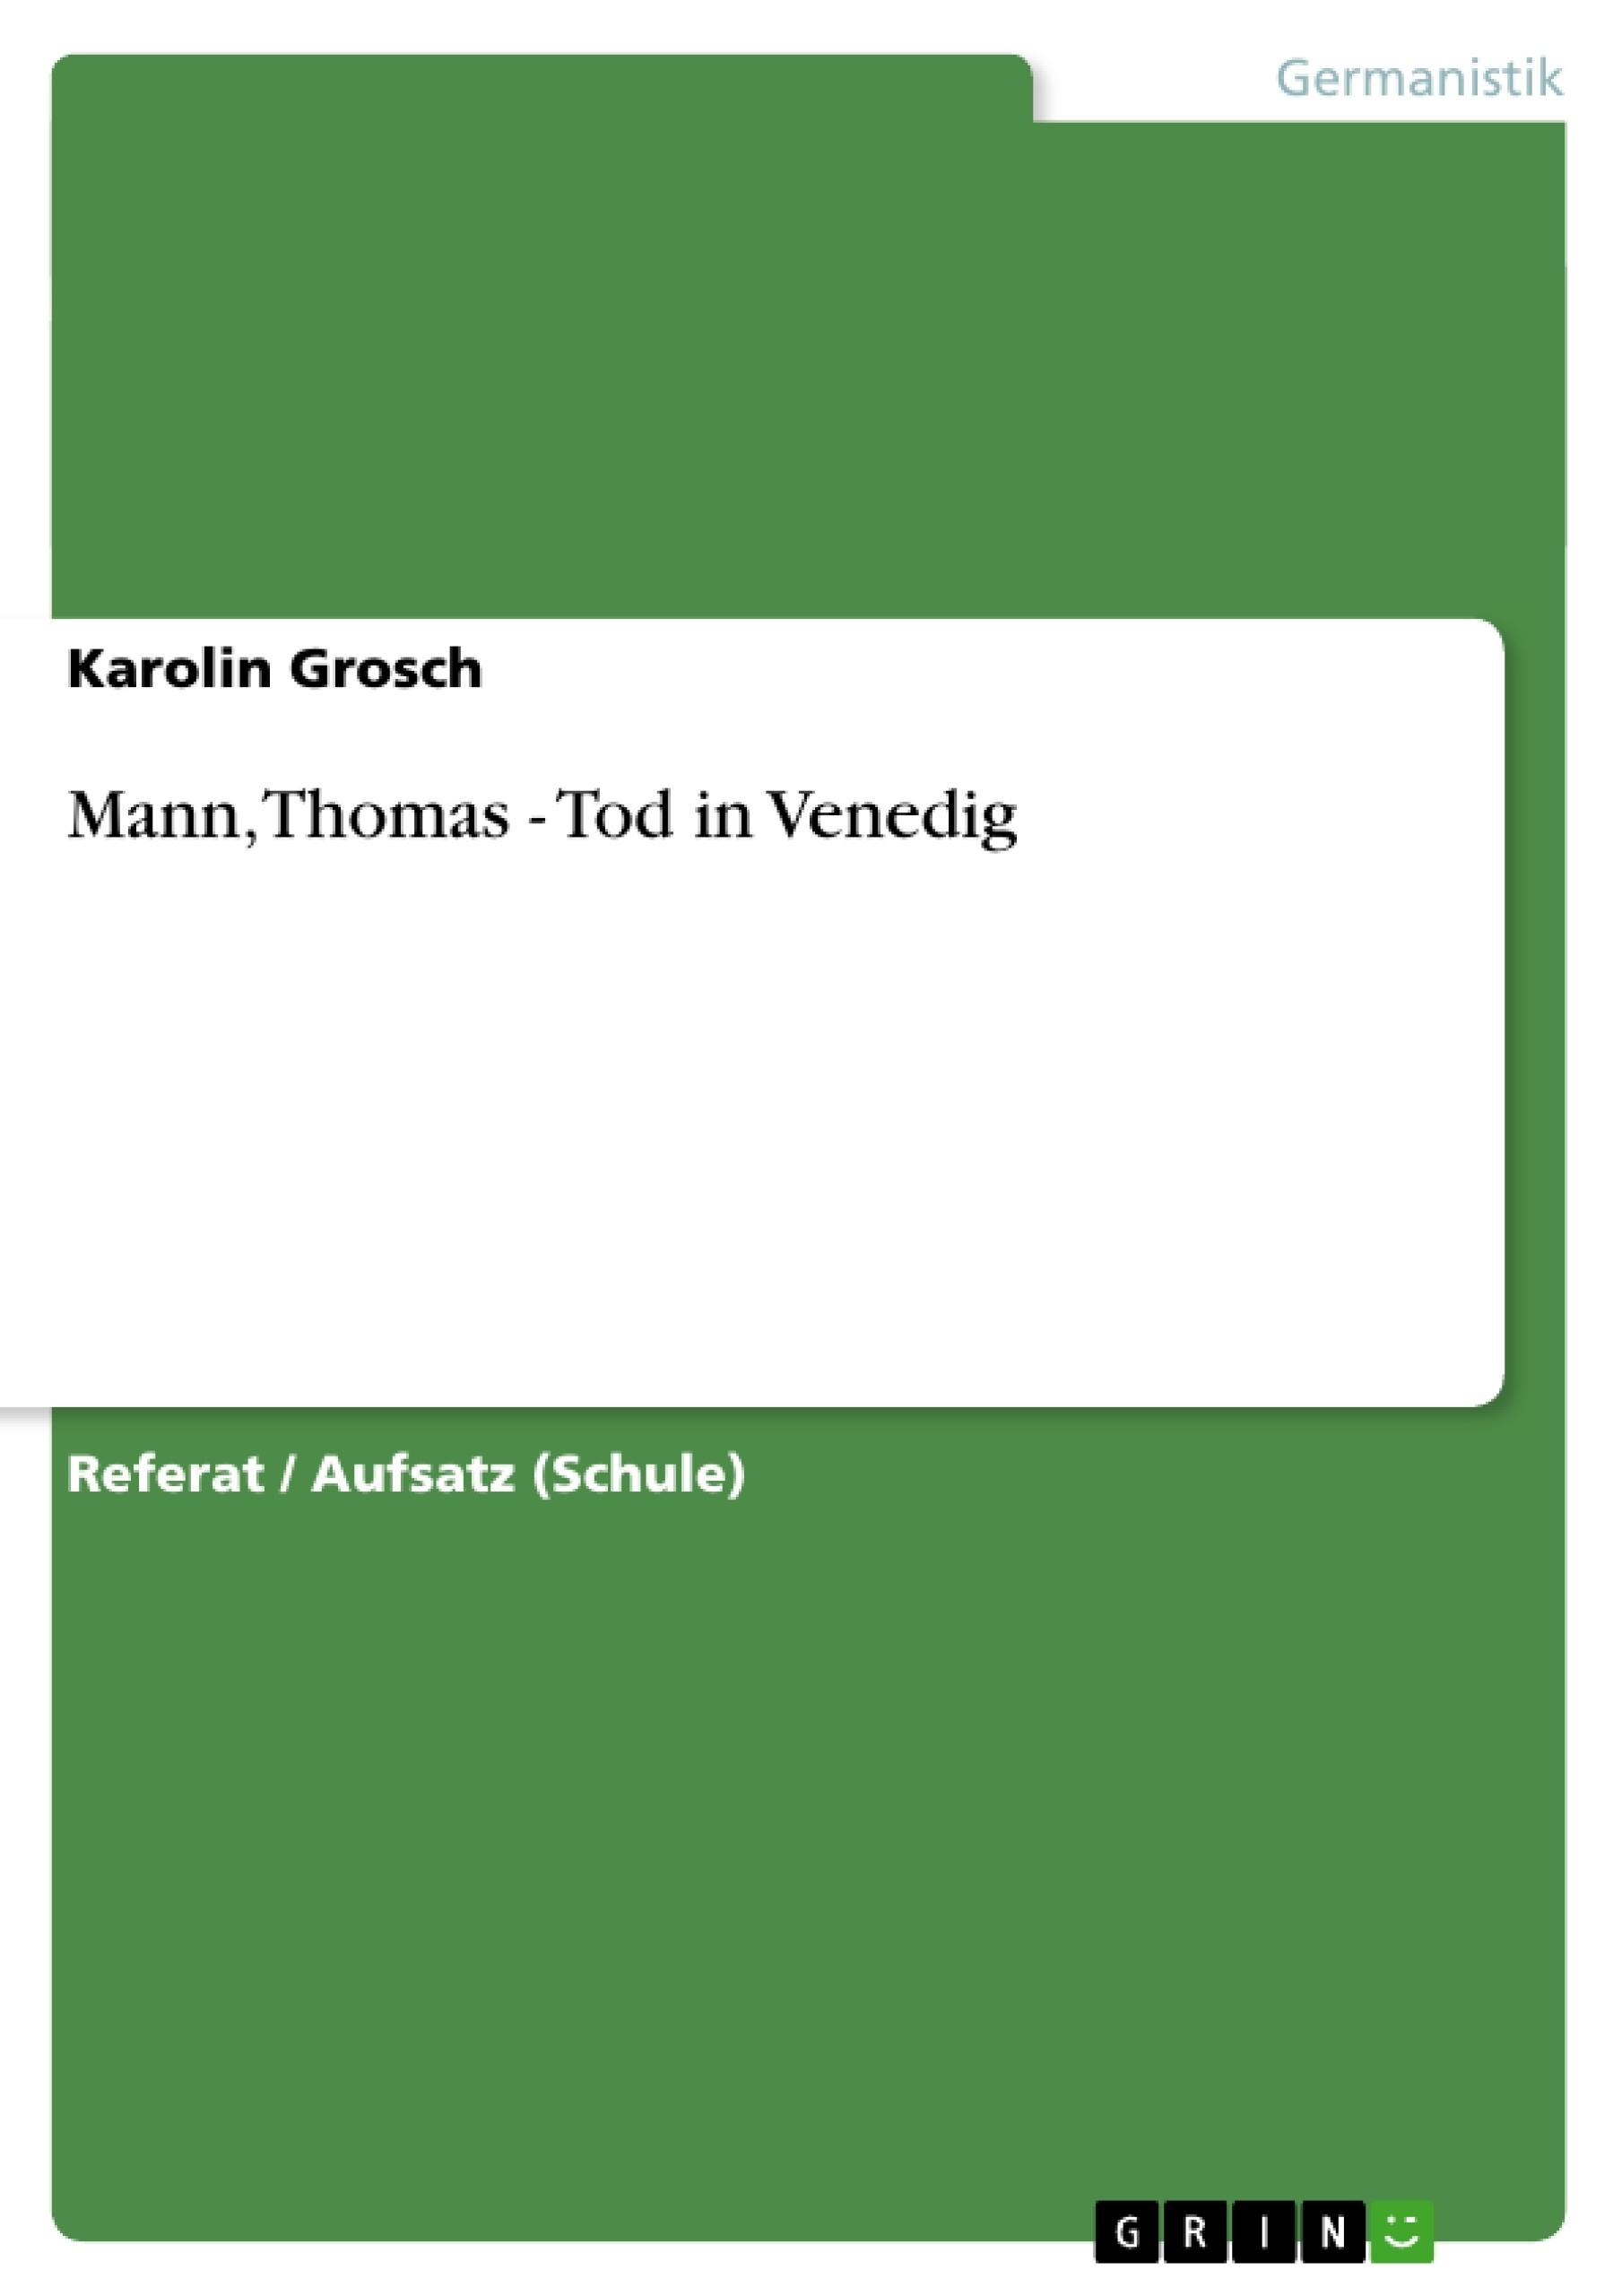 Titel: Mann, Thomas - Tod in Venedig